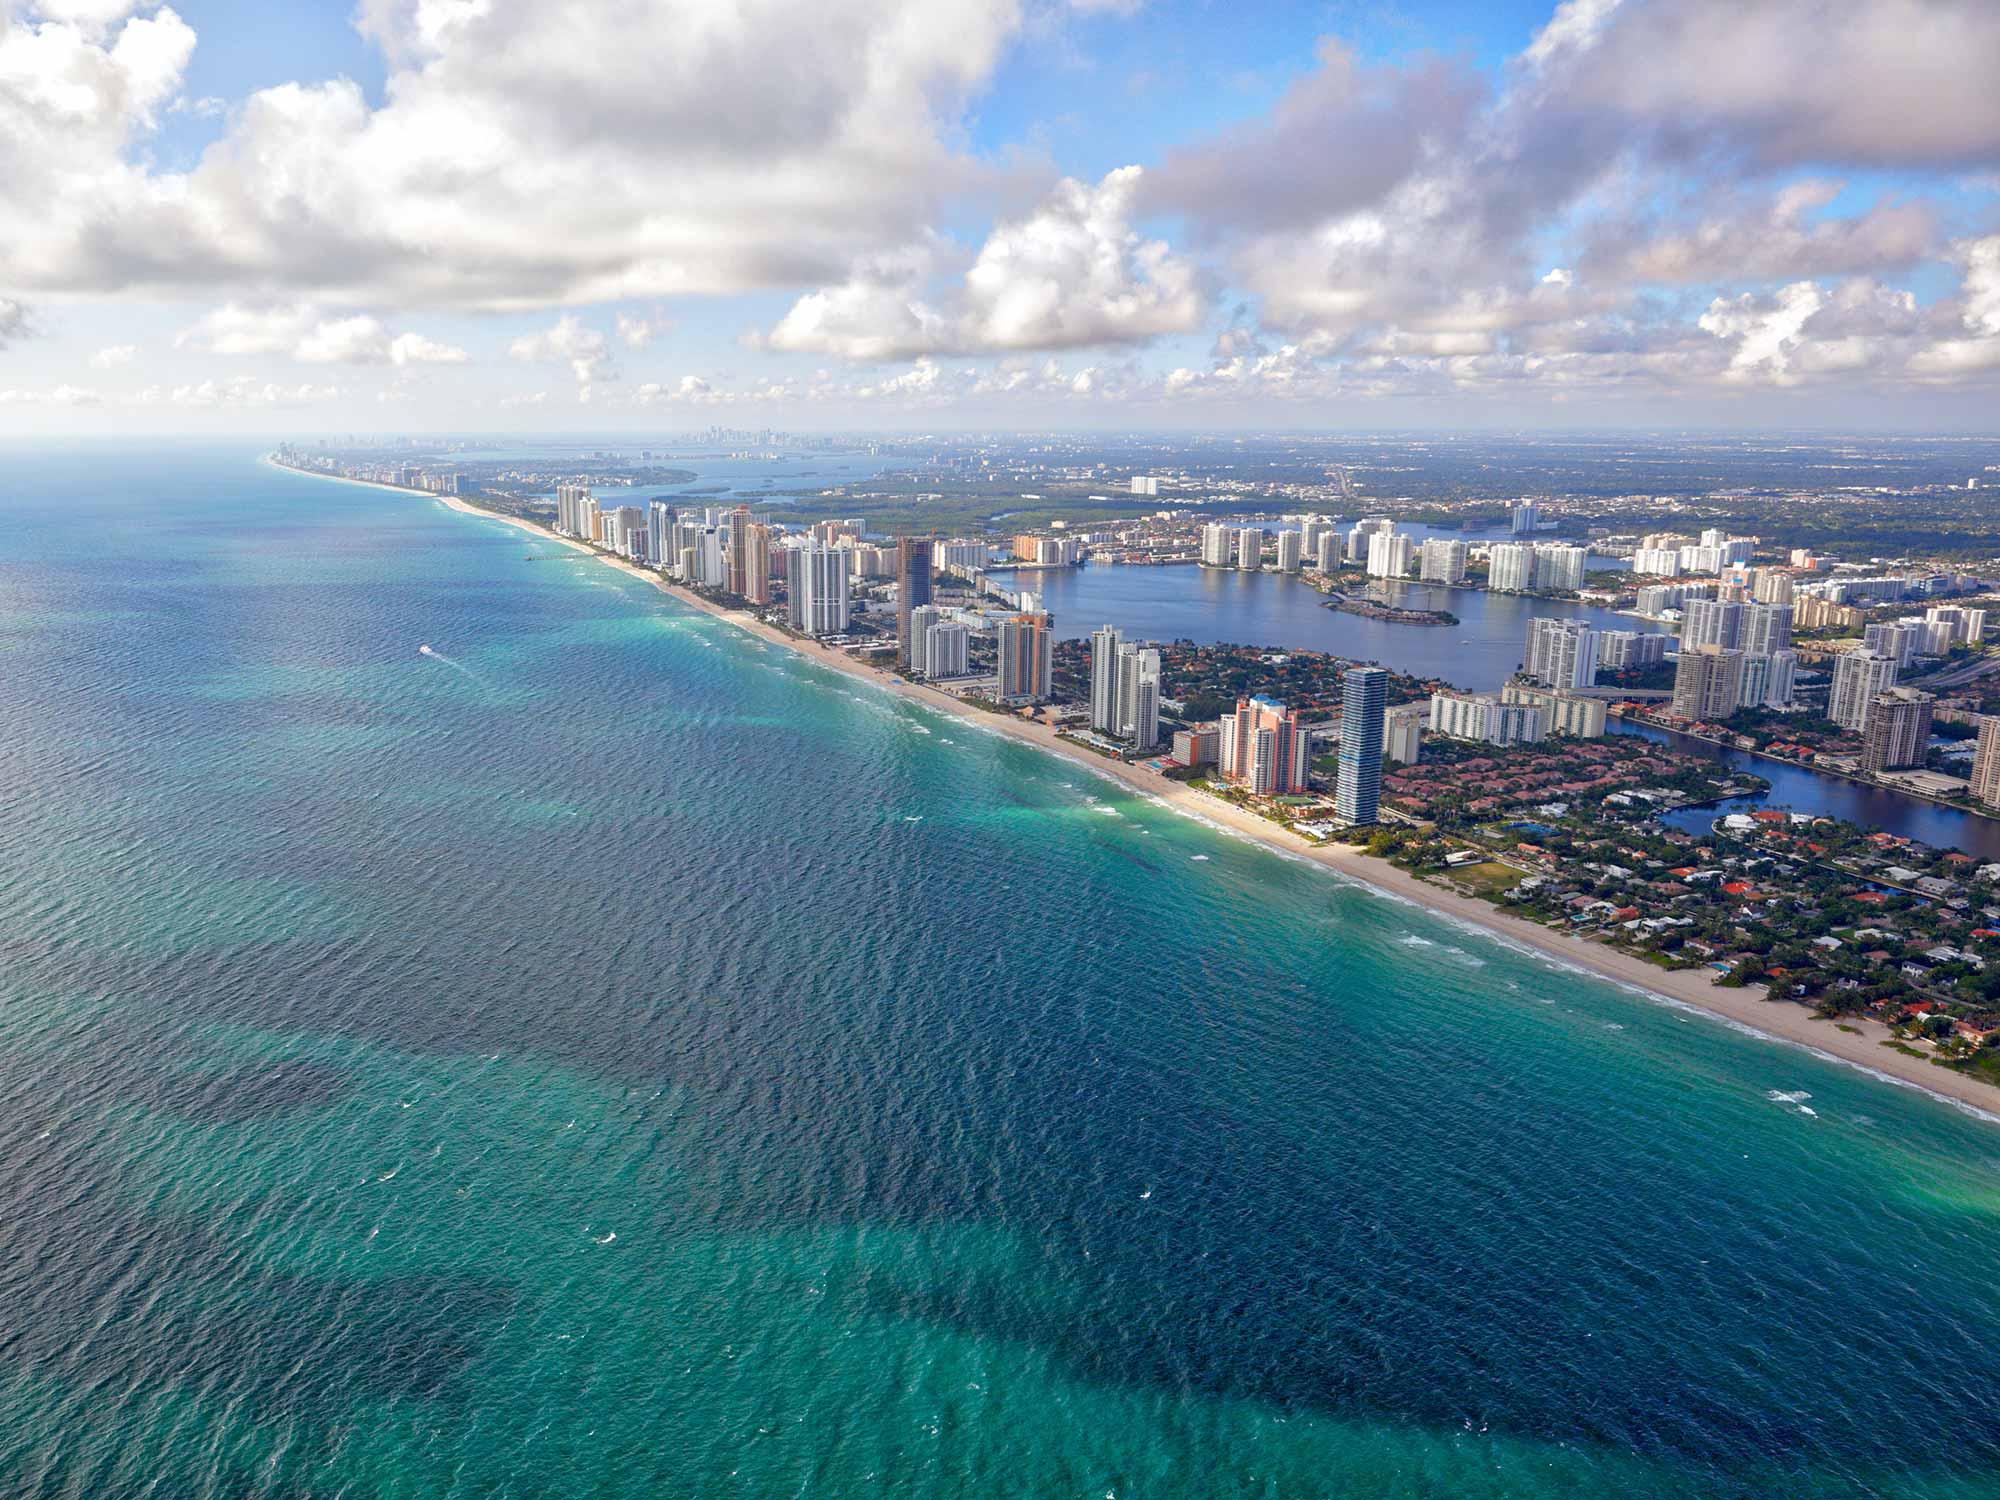 Dessine-moi un Dauphin en Floride